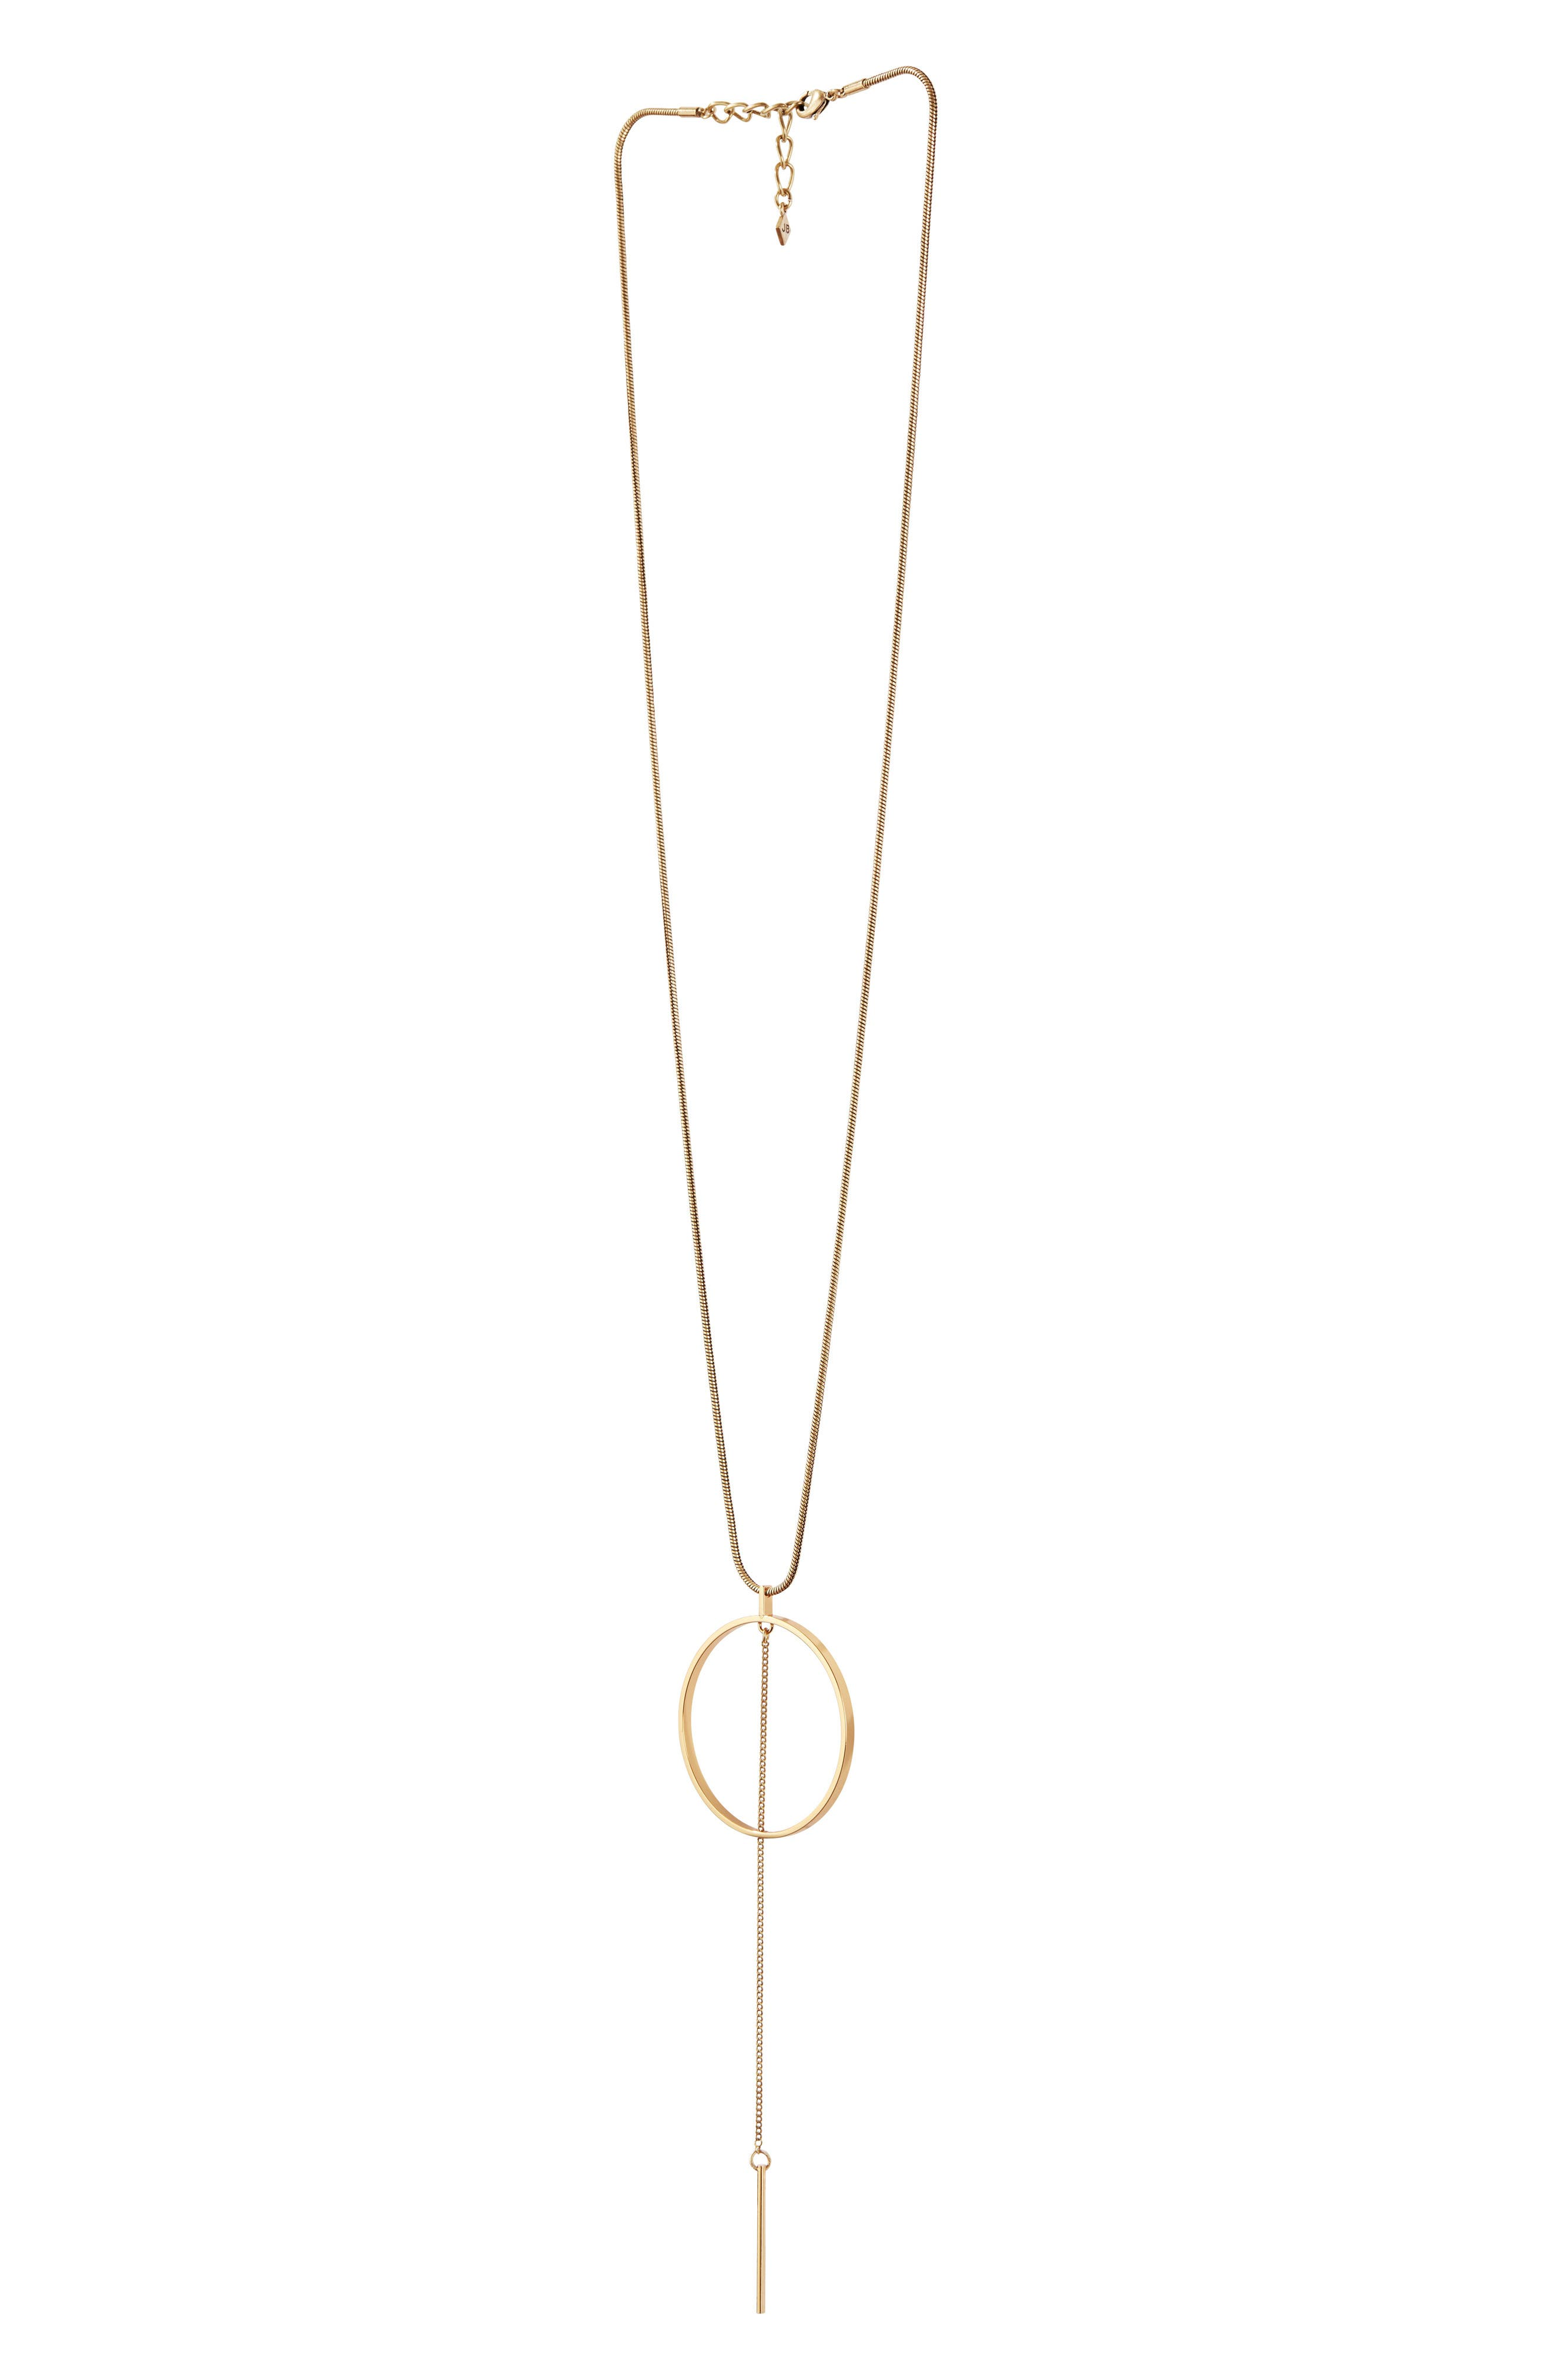 Rhine Pendant Necklace,                             Alternate thumbnail 5, color,                             GOLD